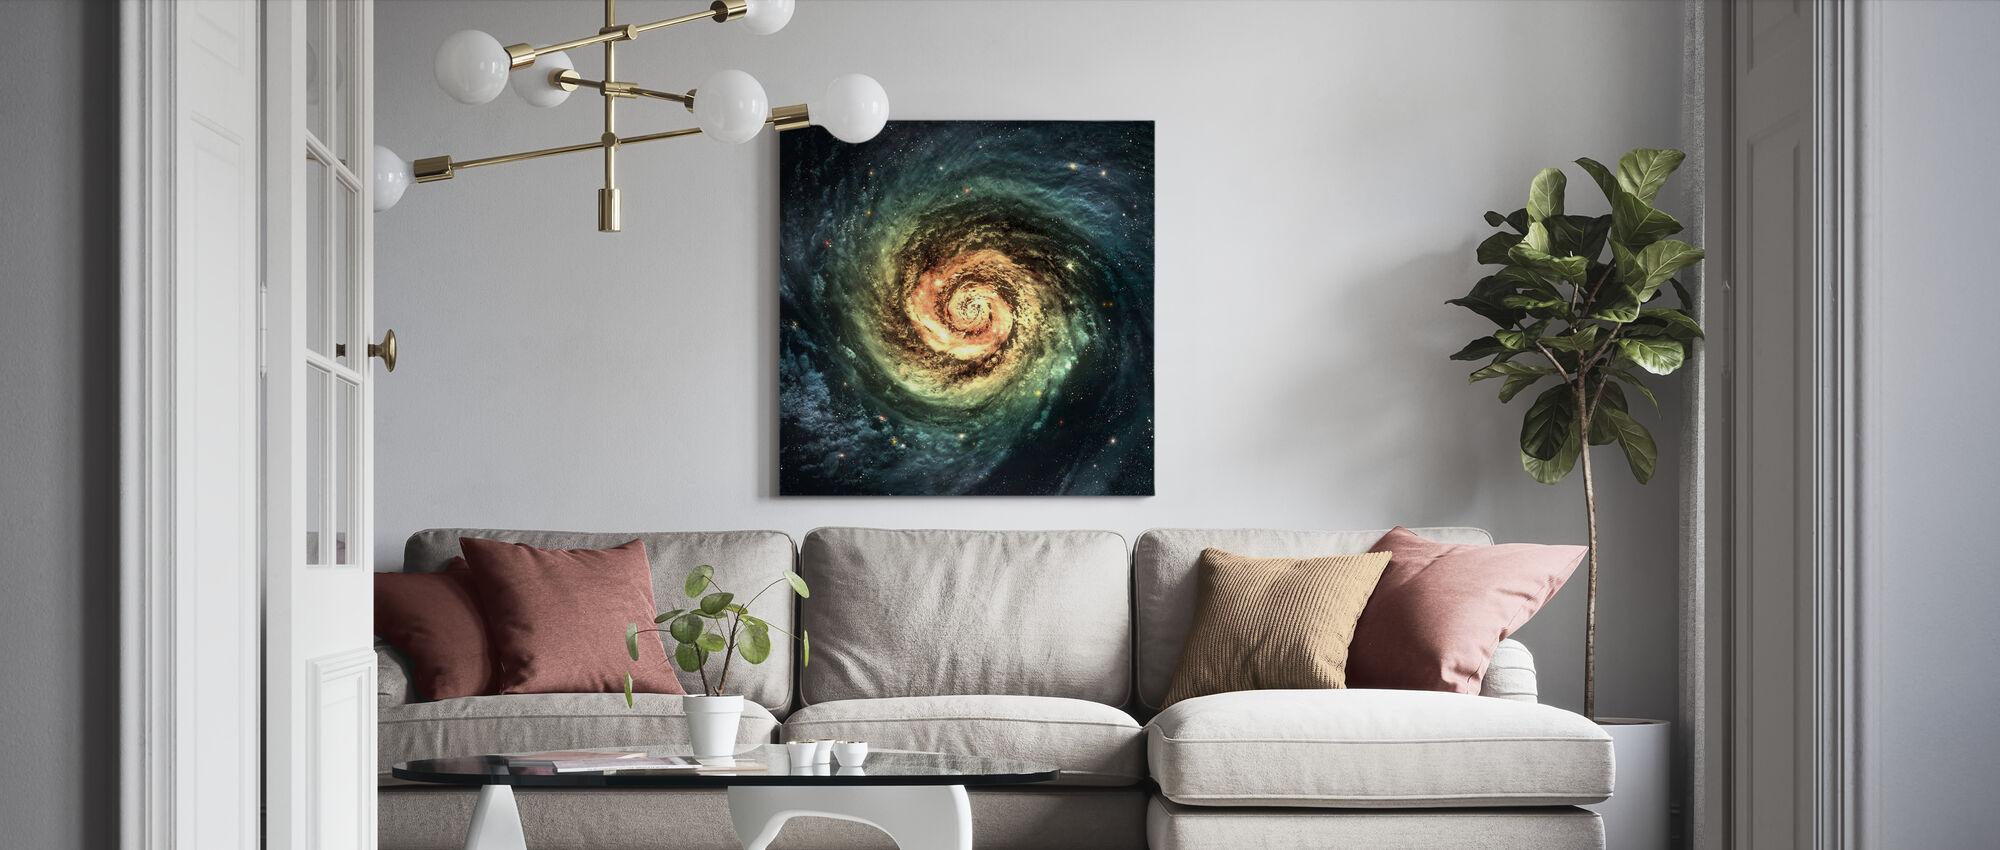 Spiraali Galaxy - Canvastaulu - Olohuone